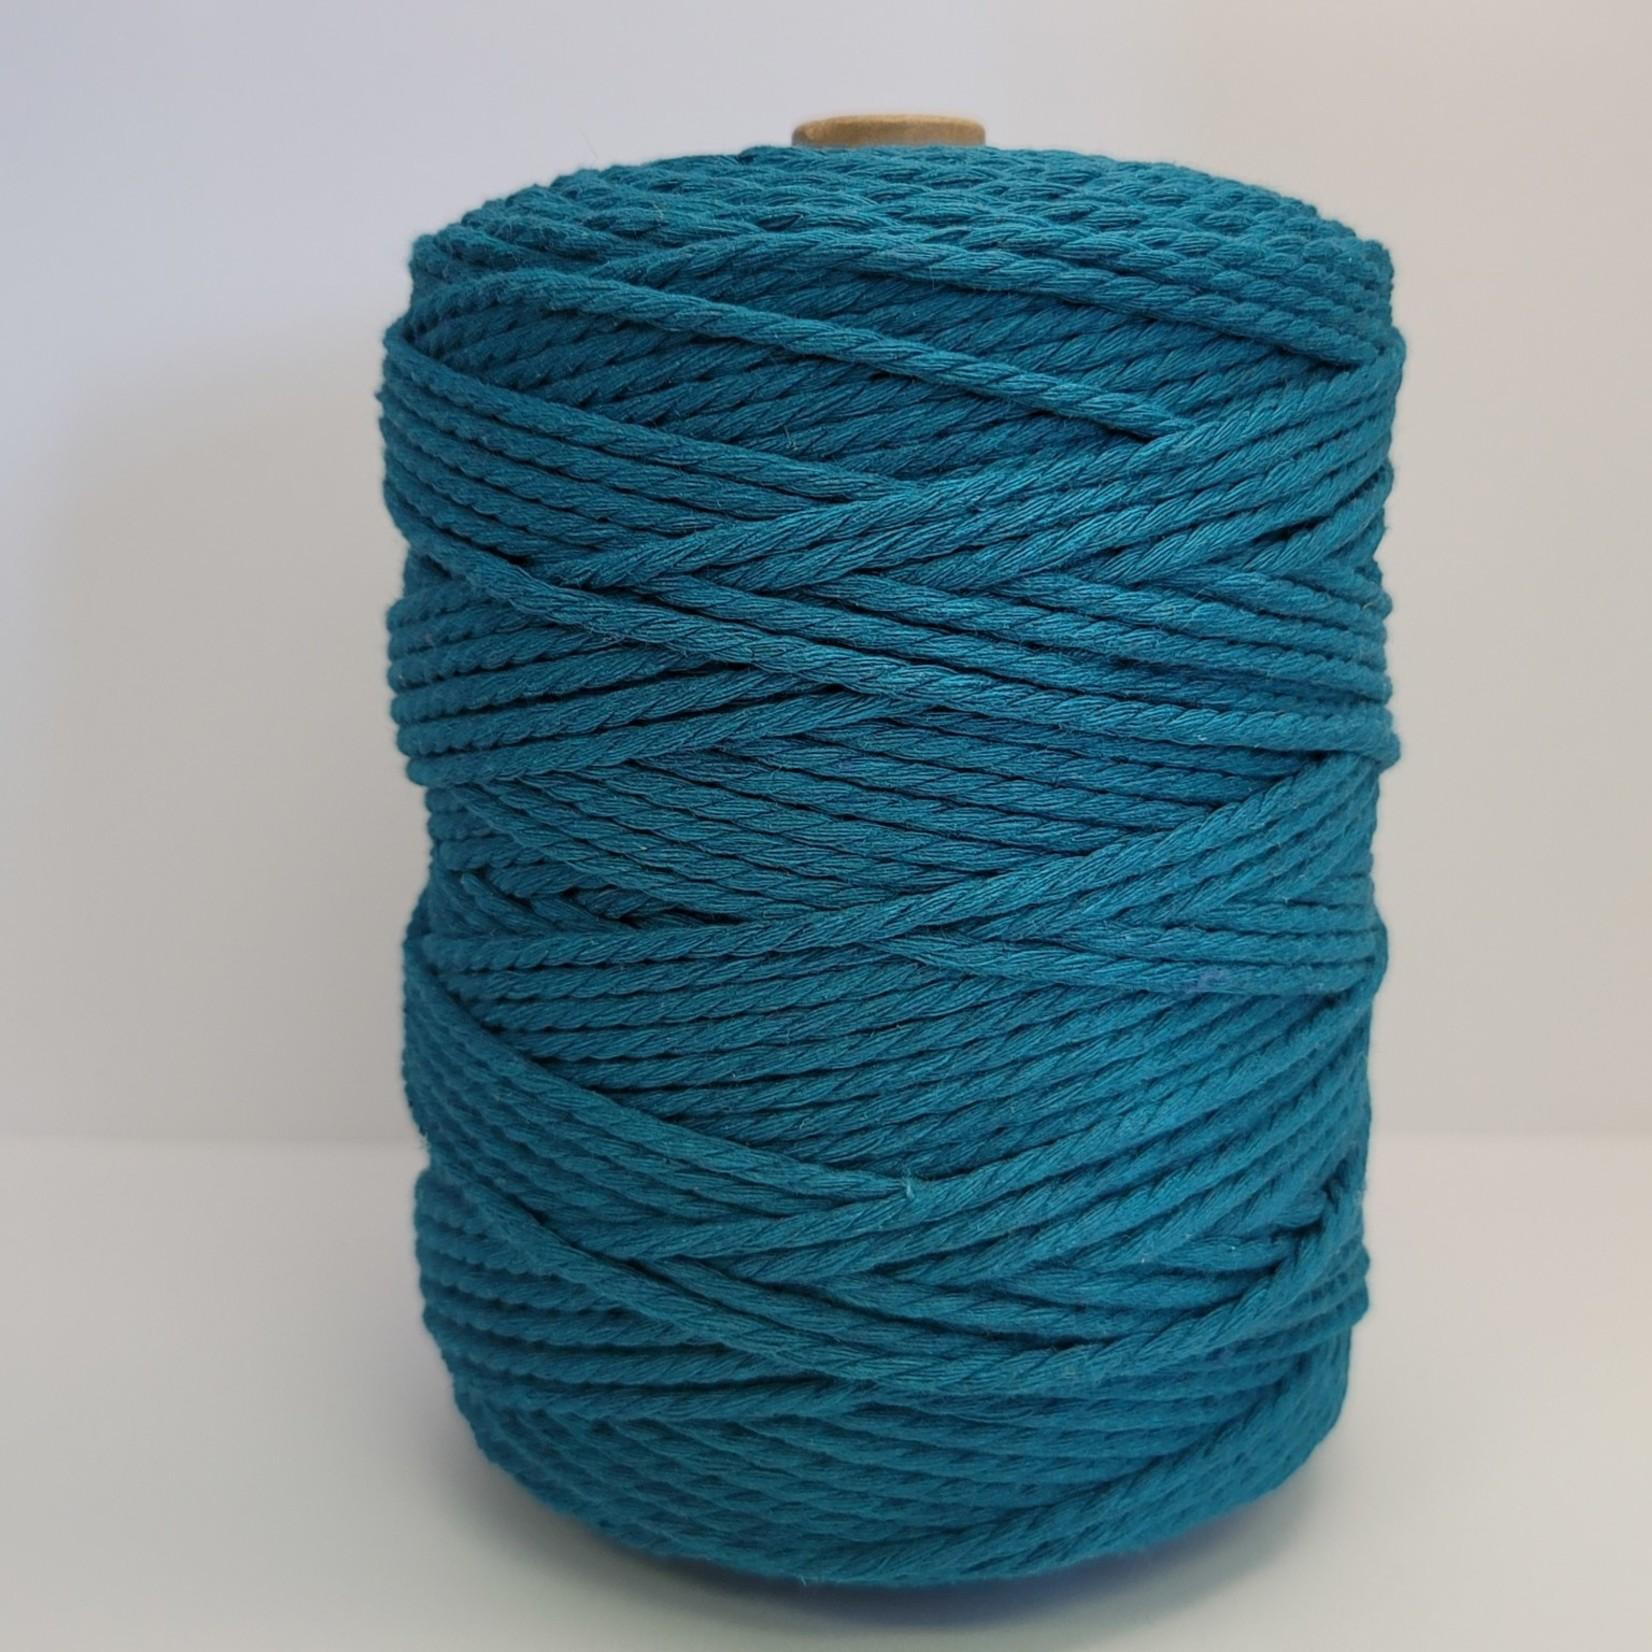 3mm Triple Strand Macrame Rope - 1kg approx 1000ft  - Deep Teal